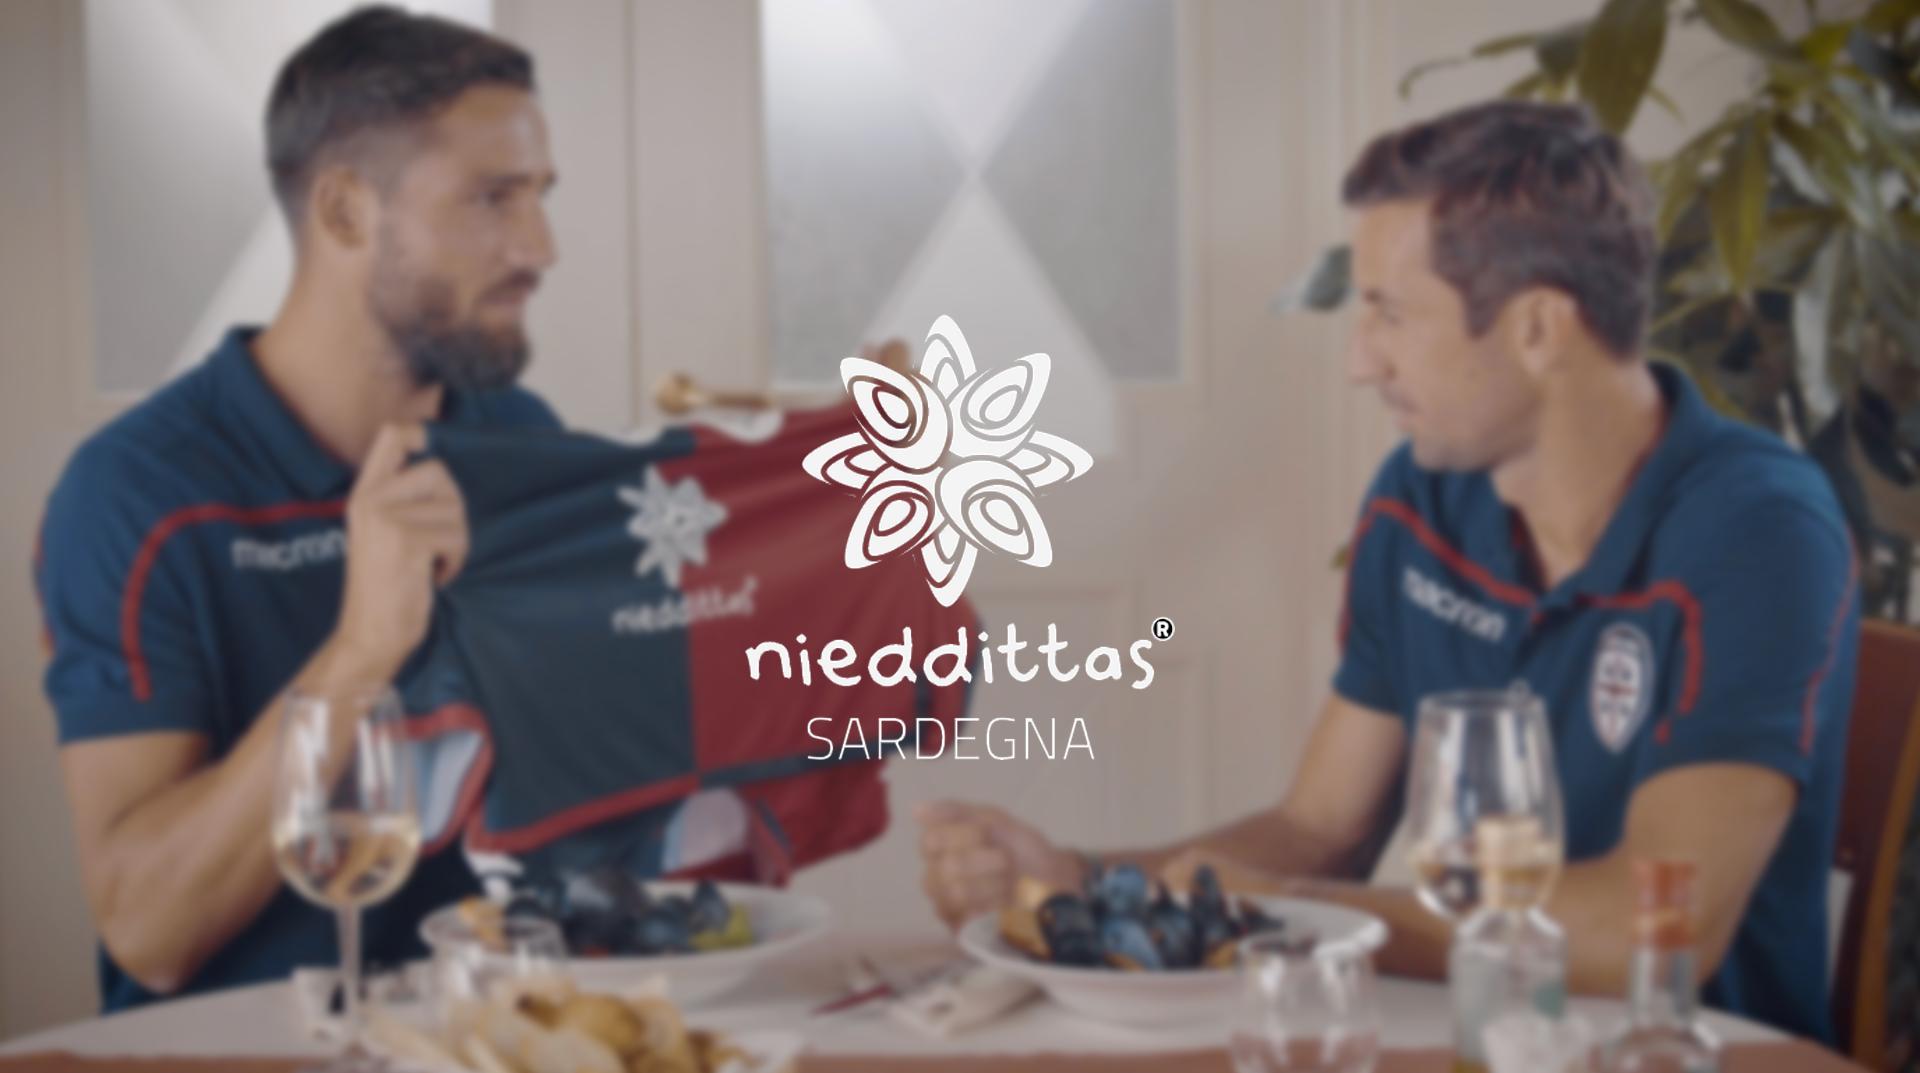 Nieddittas